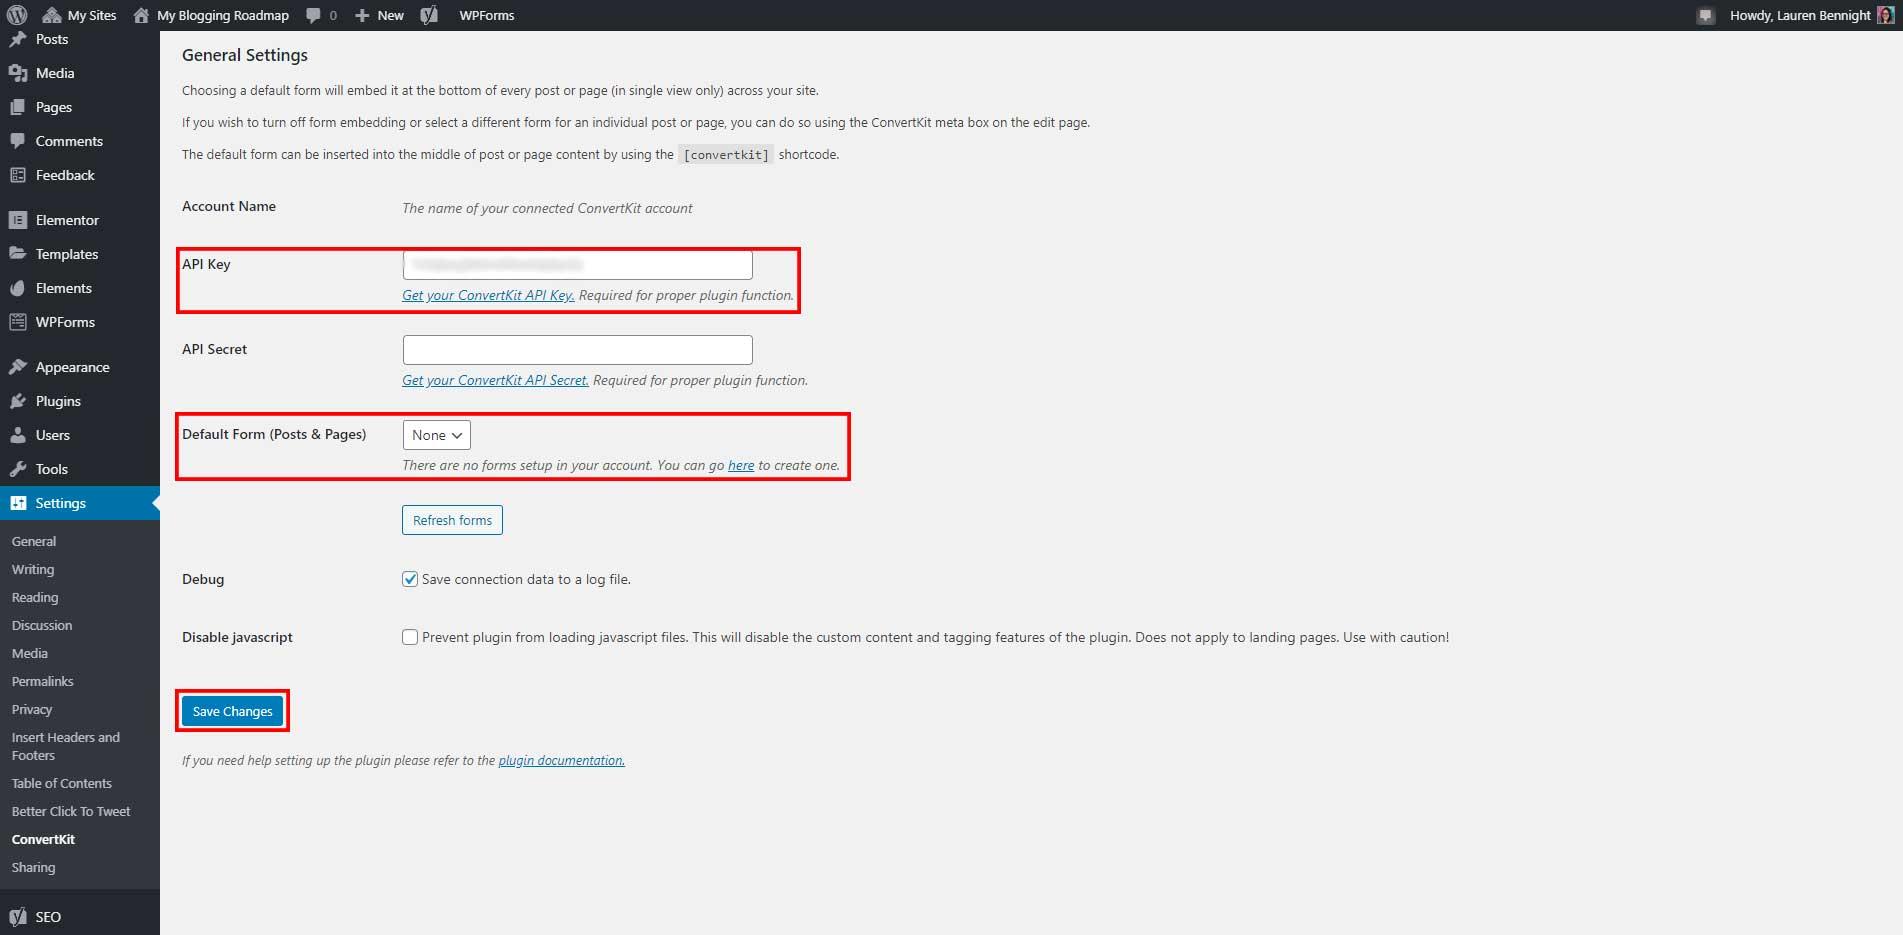 API key default form